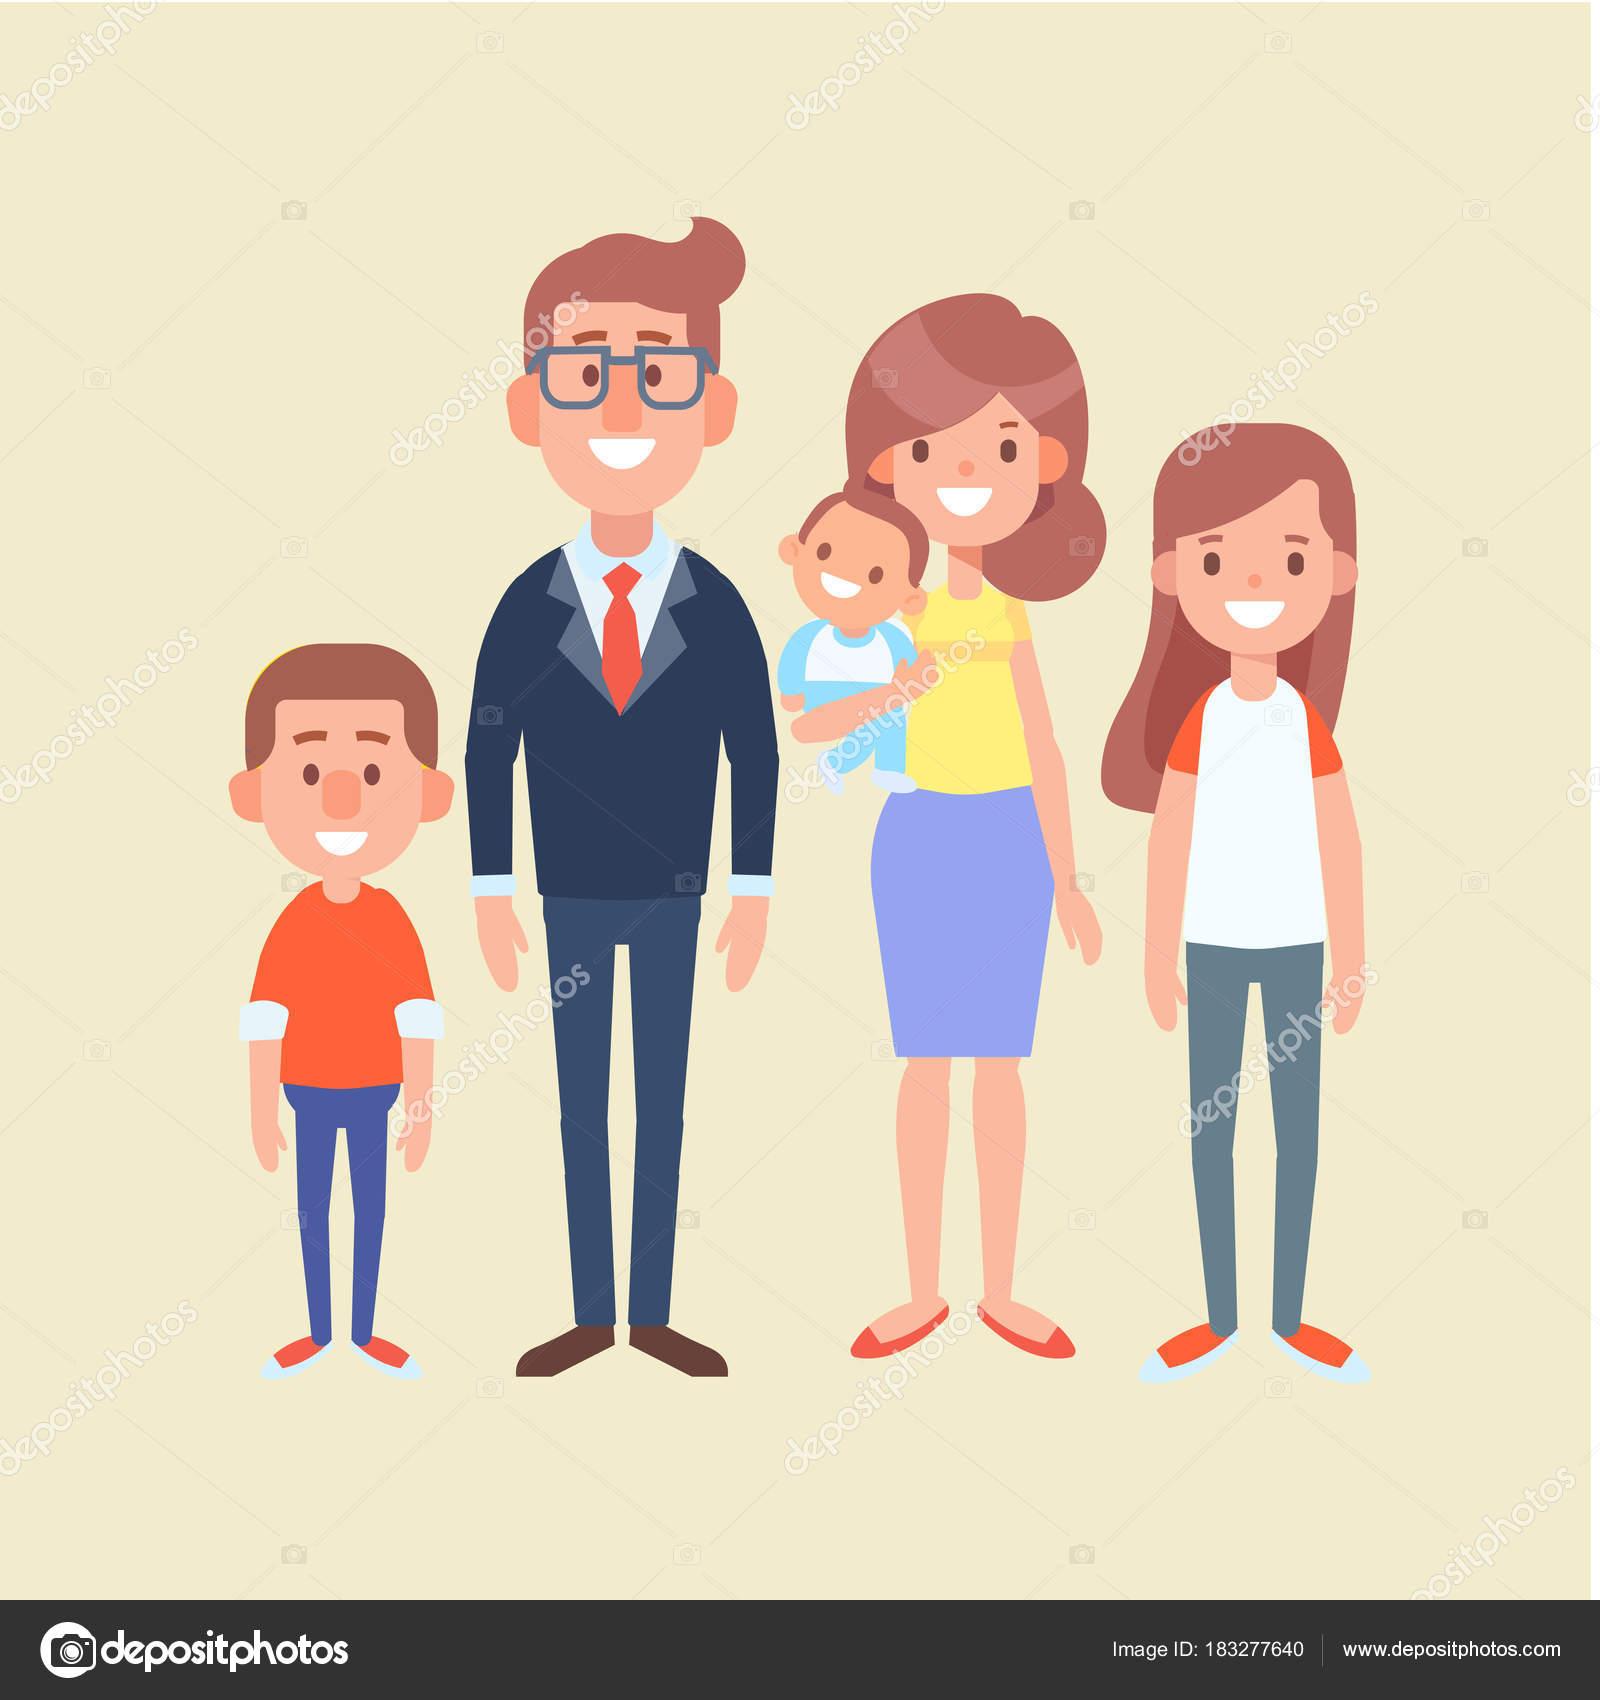 Vector Family Together Flat Cartoon Design Illustration Stock Vector C Oksana L 183277640